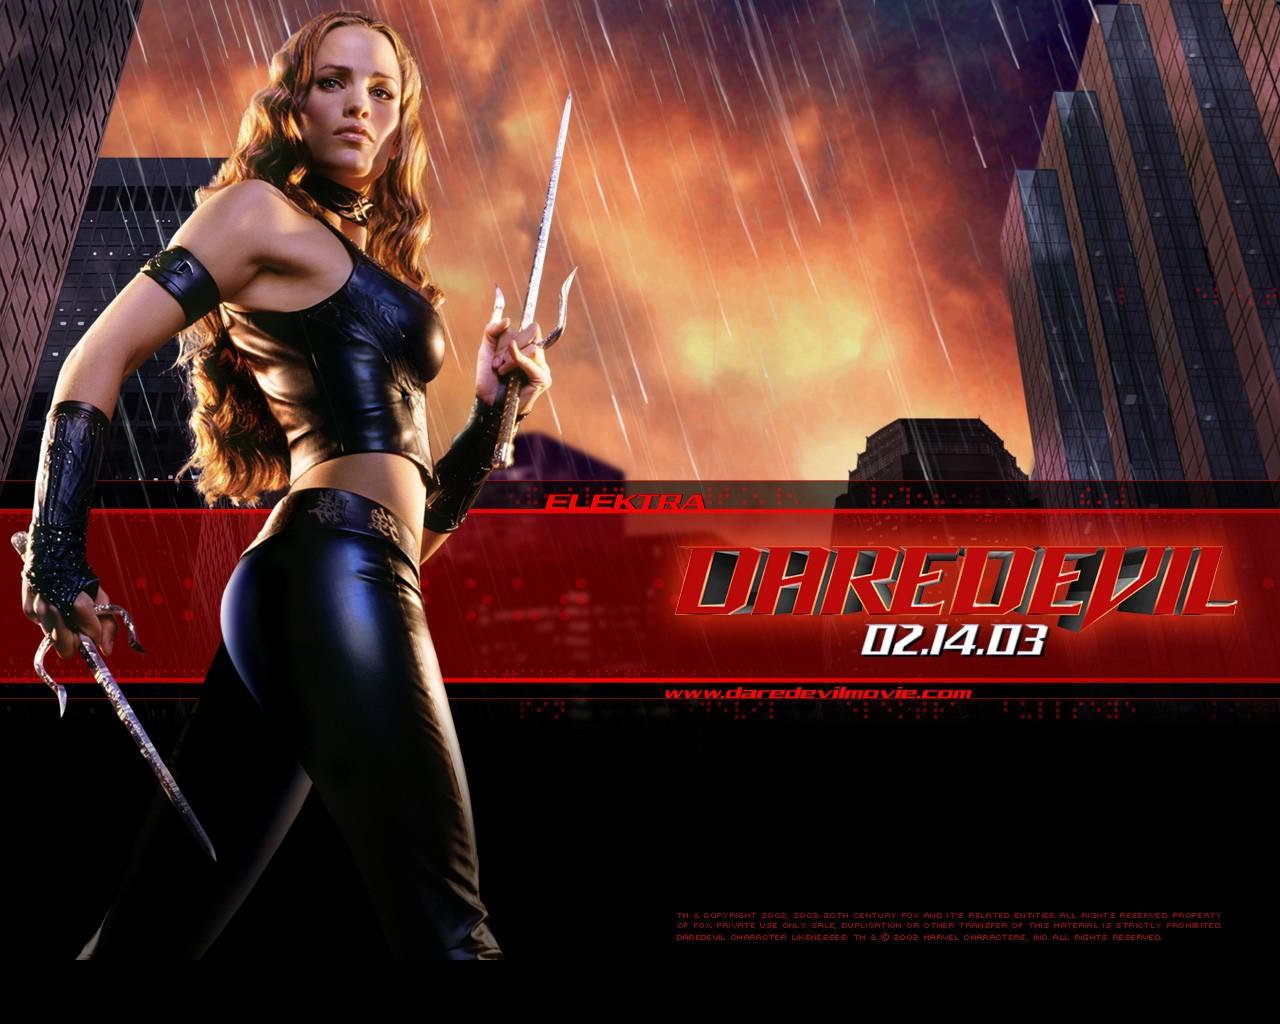 Un wallpaper ufficiale di Elektra (Jennifer Garner) per il film Daredevil